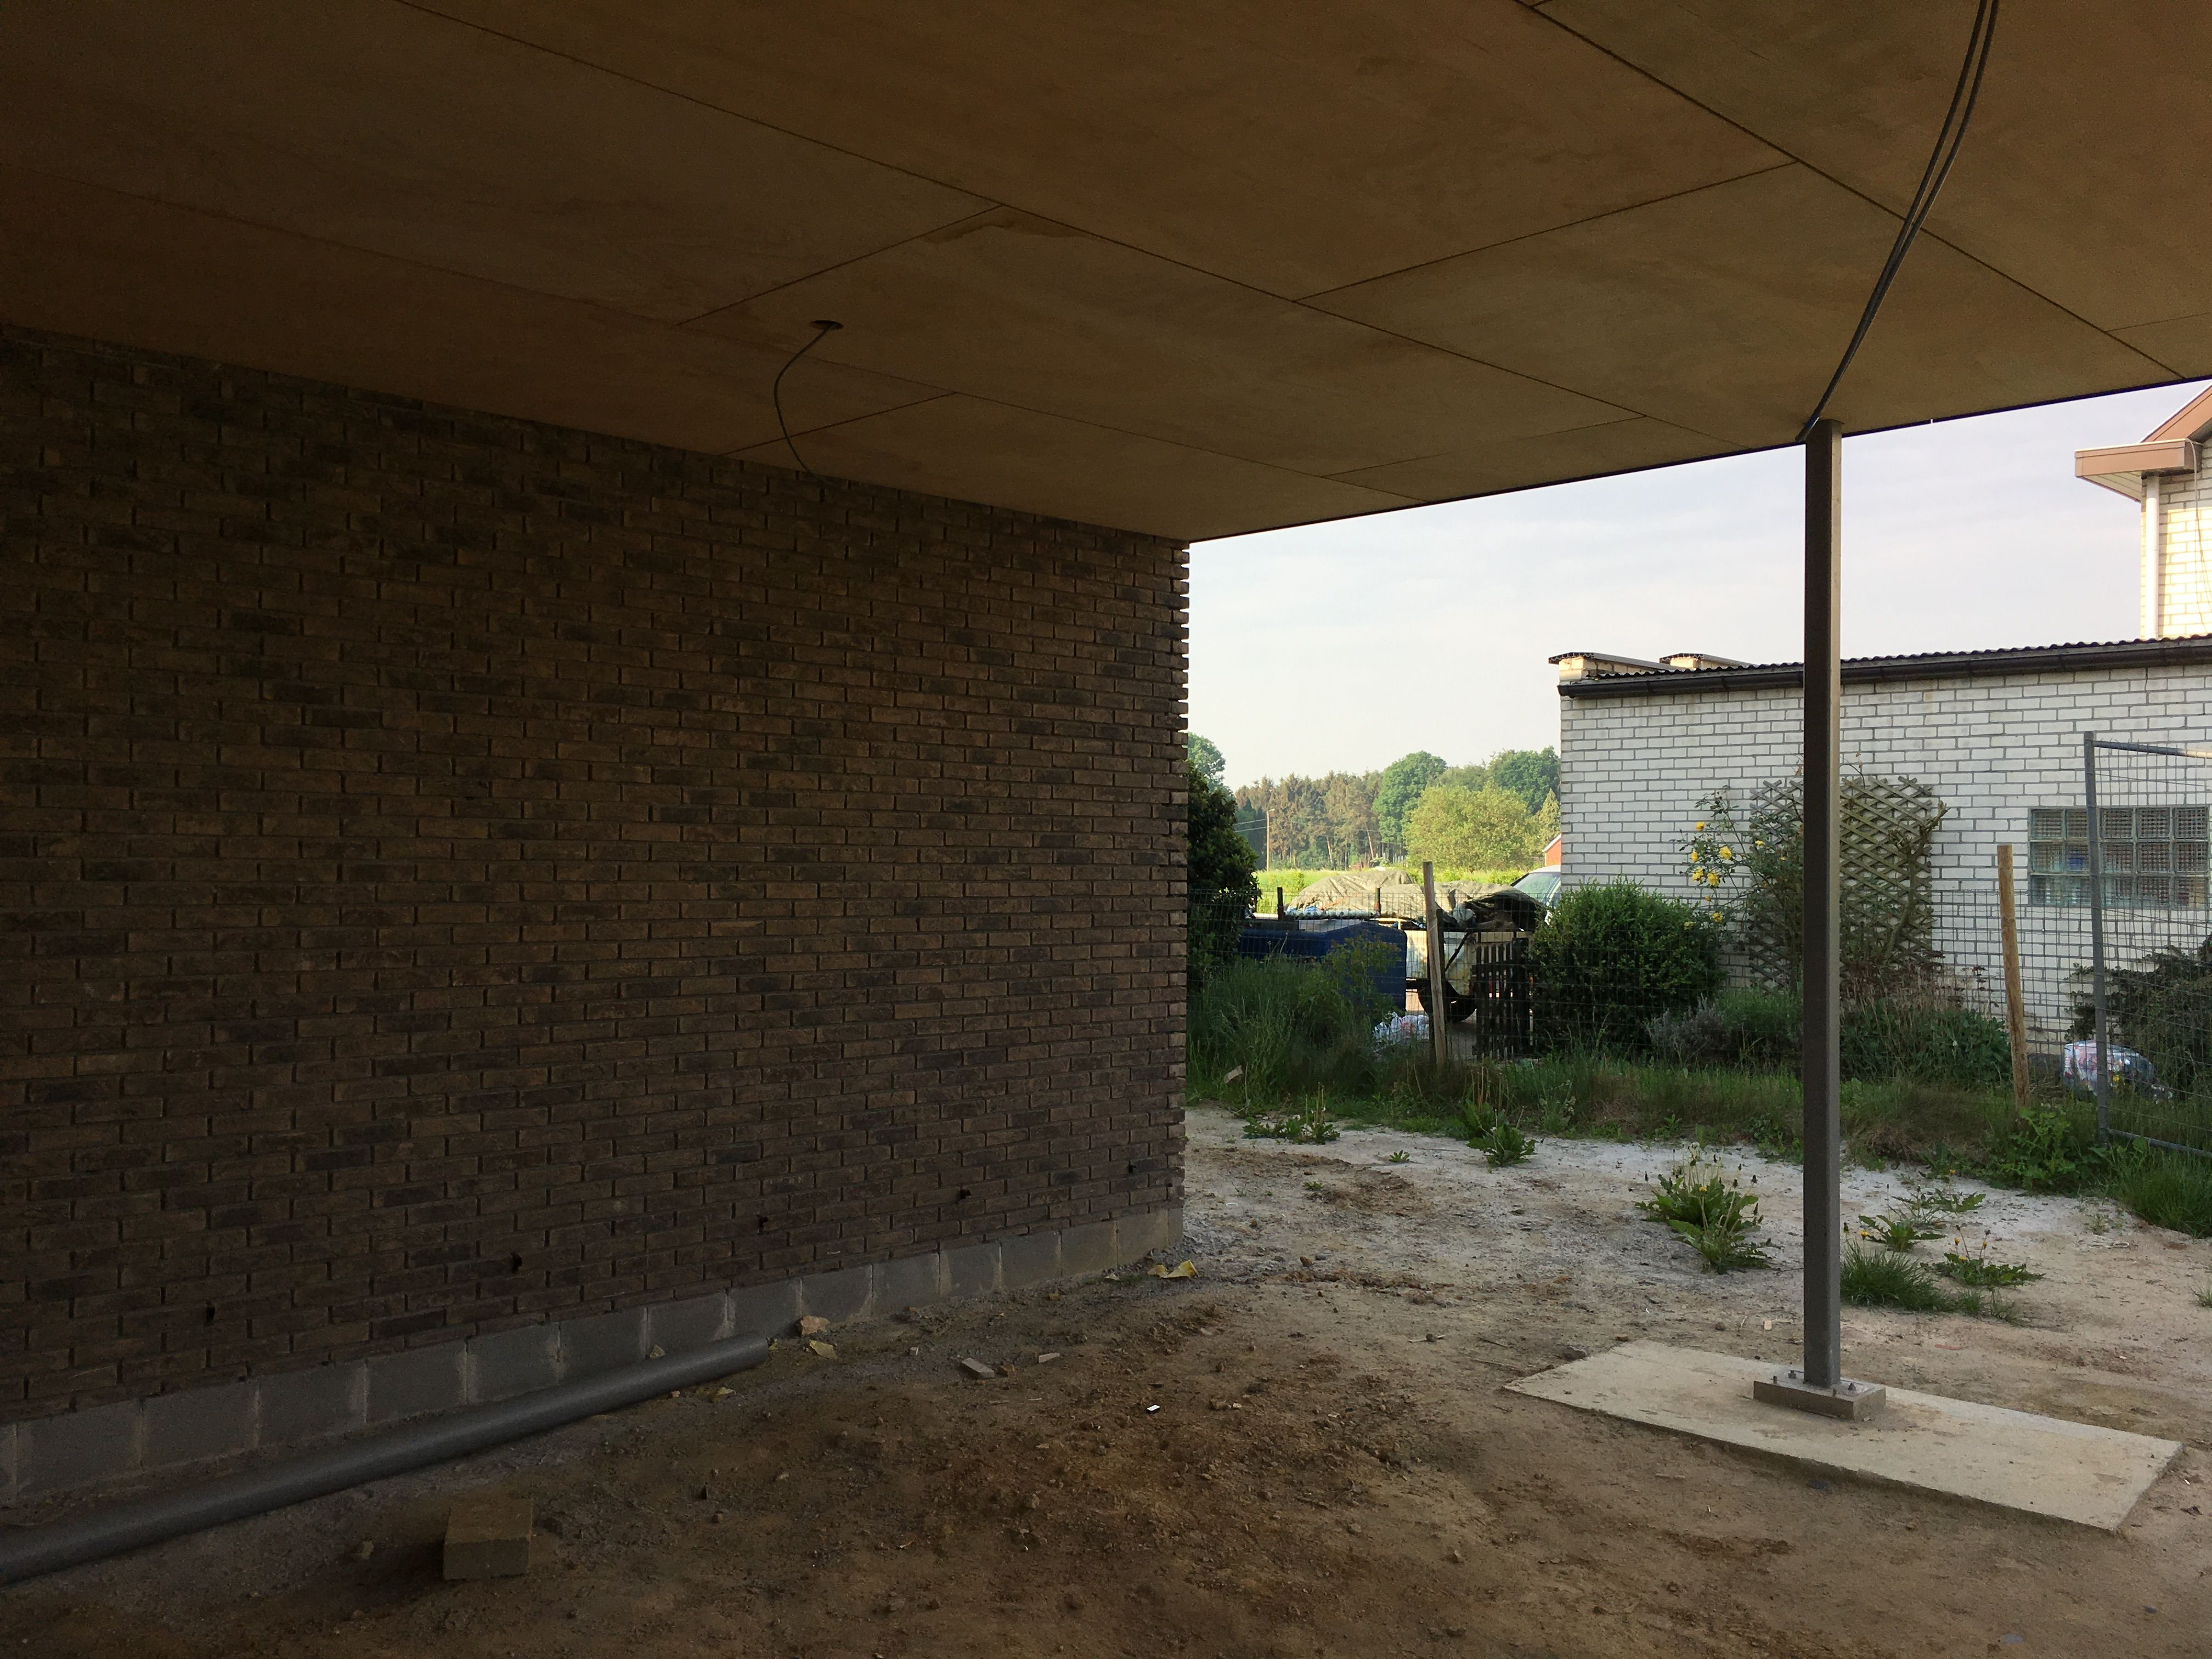 Uitbekleding plafond carport in multiplex 1633CAMB stam.be ...